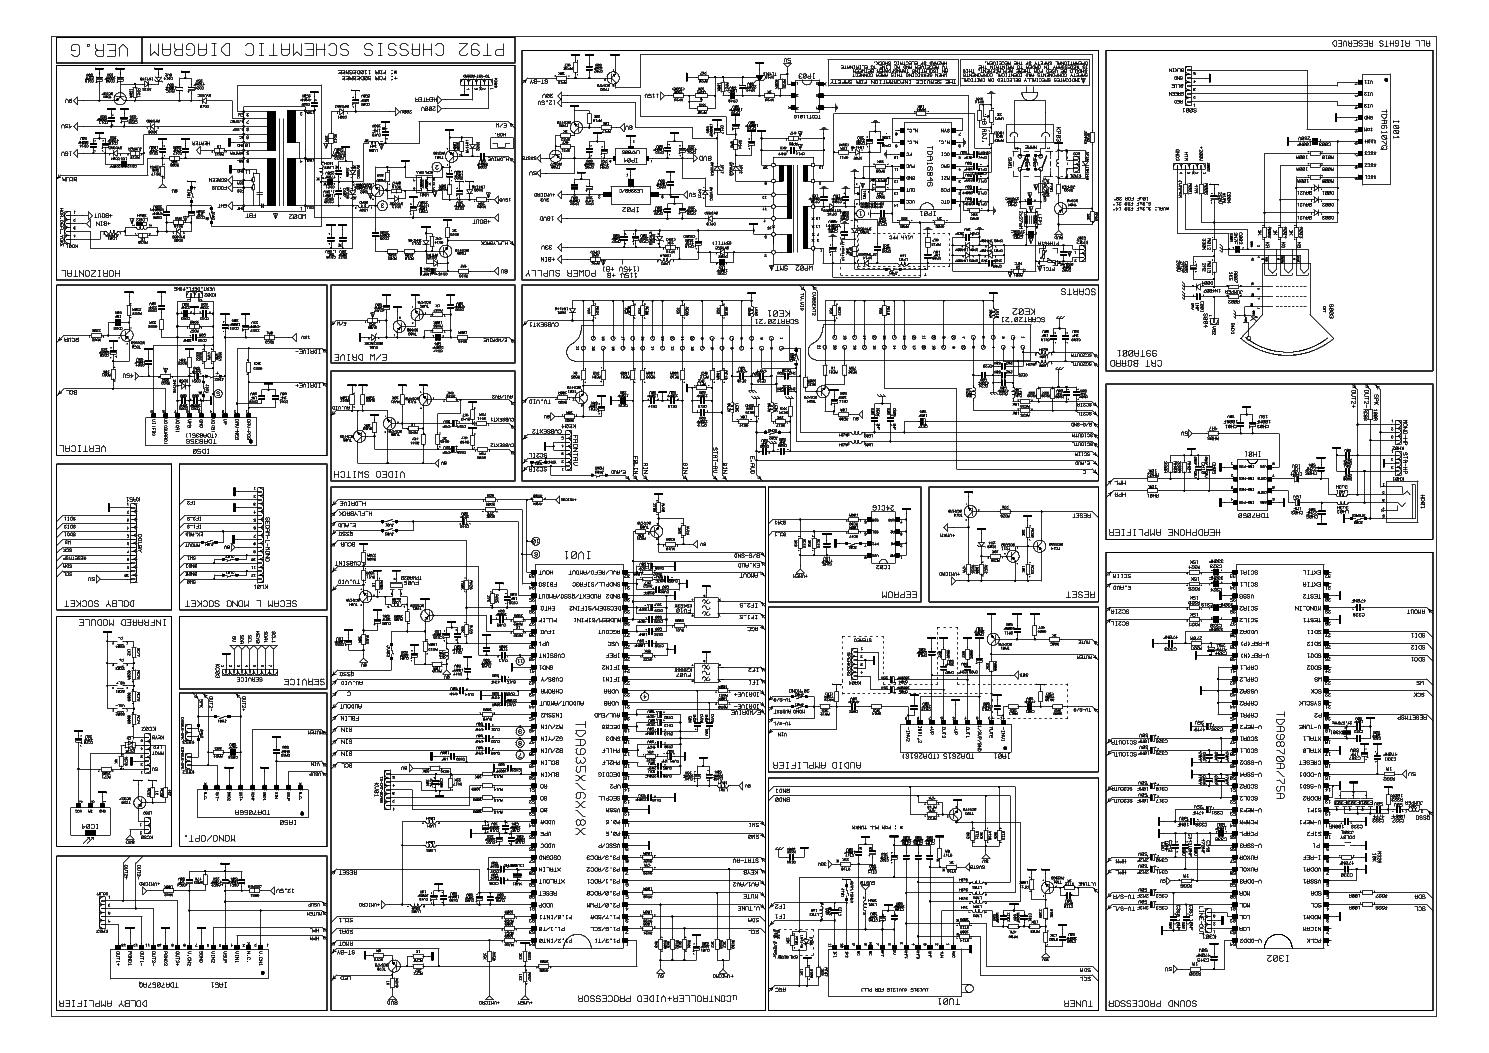 Karcher k2 02 manual